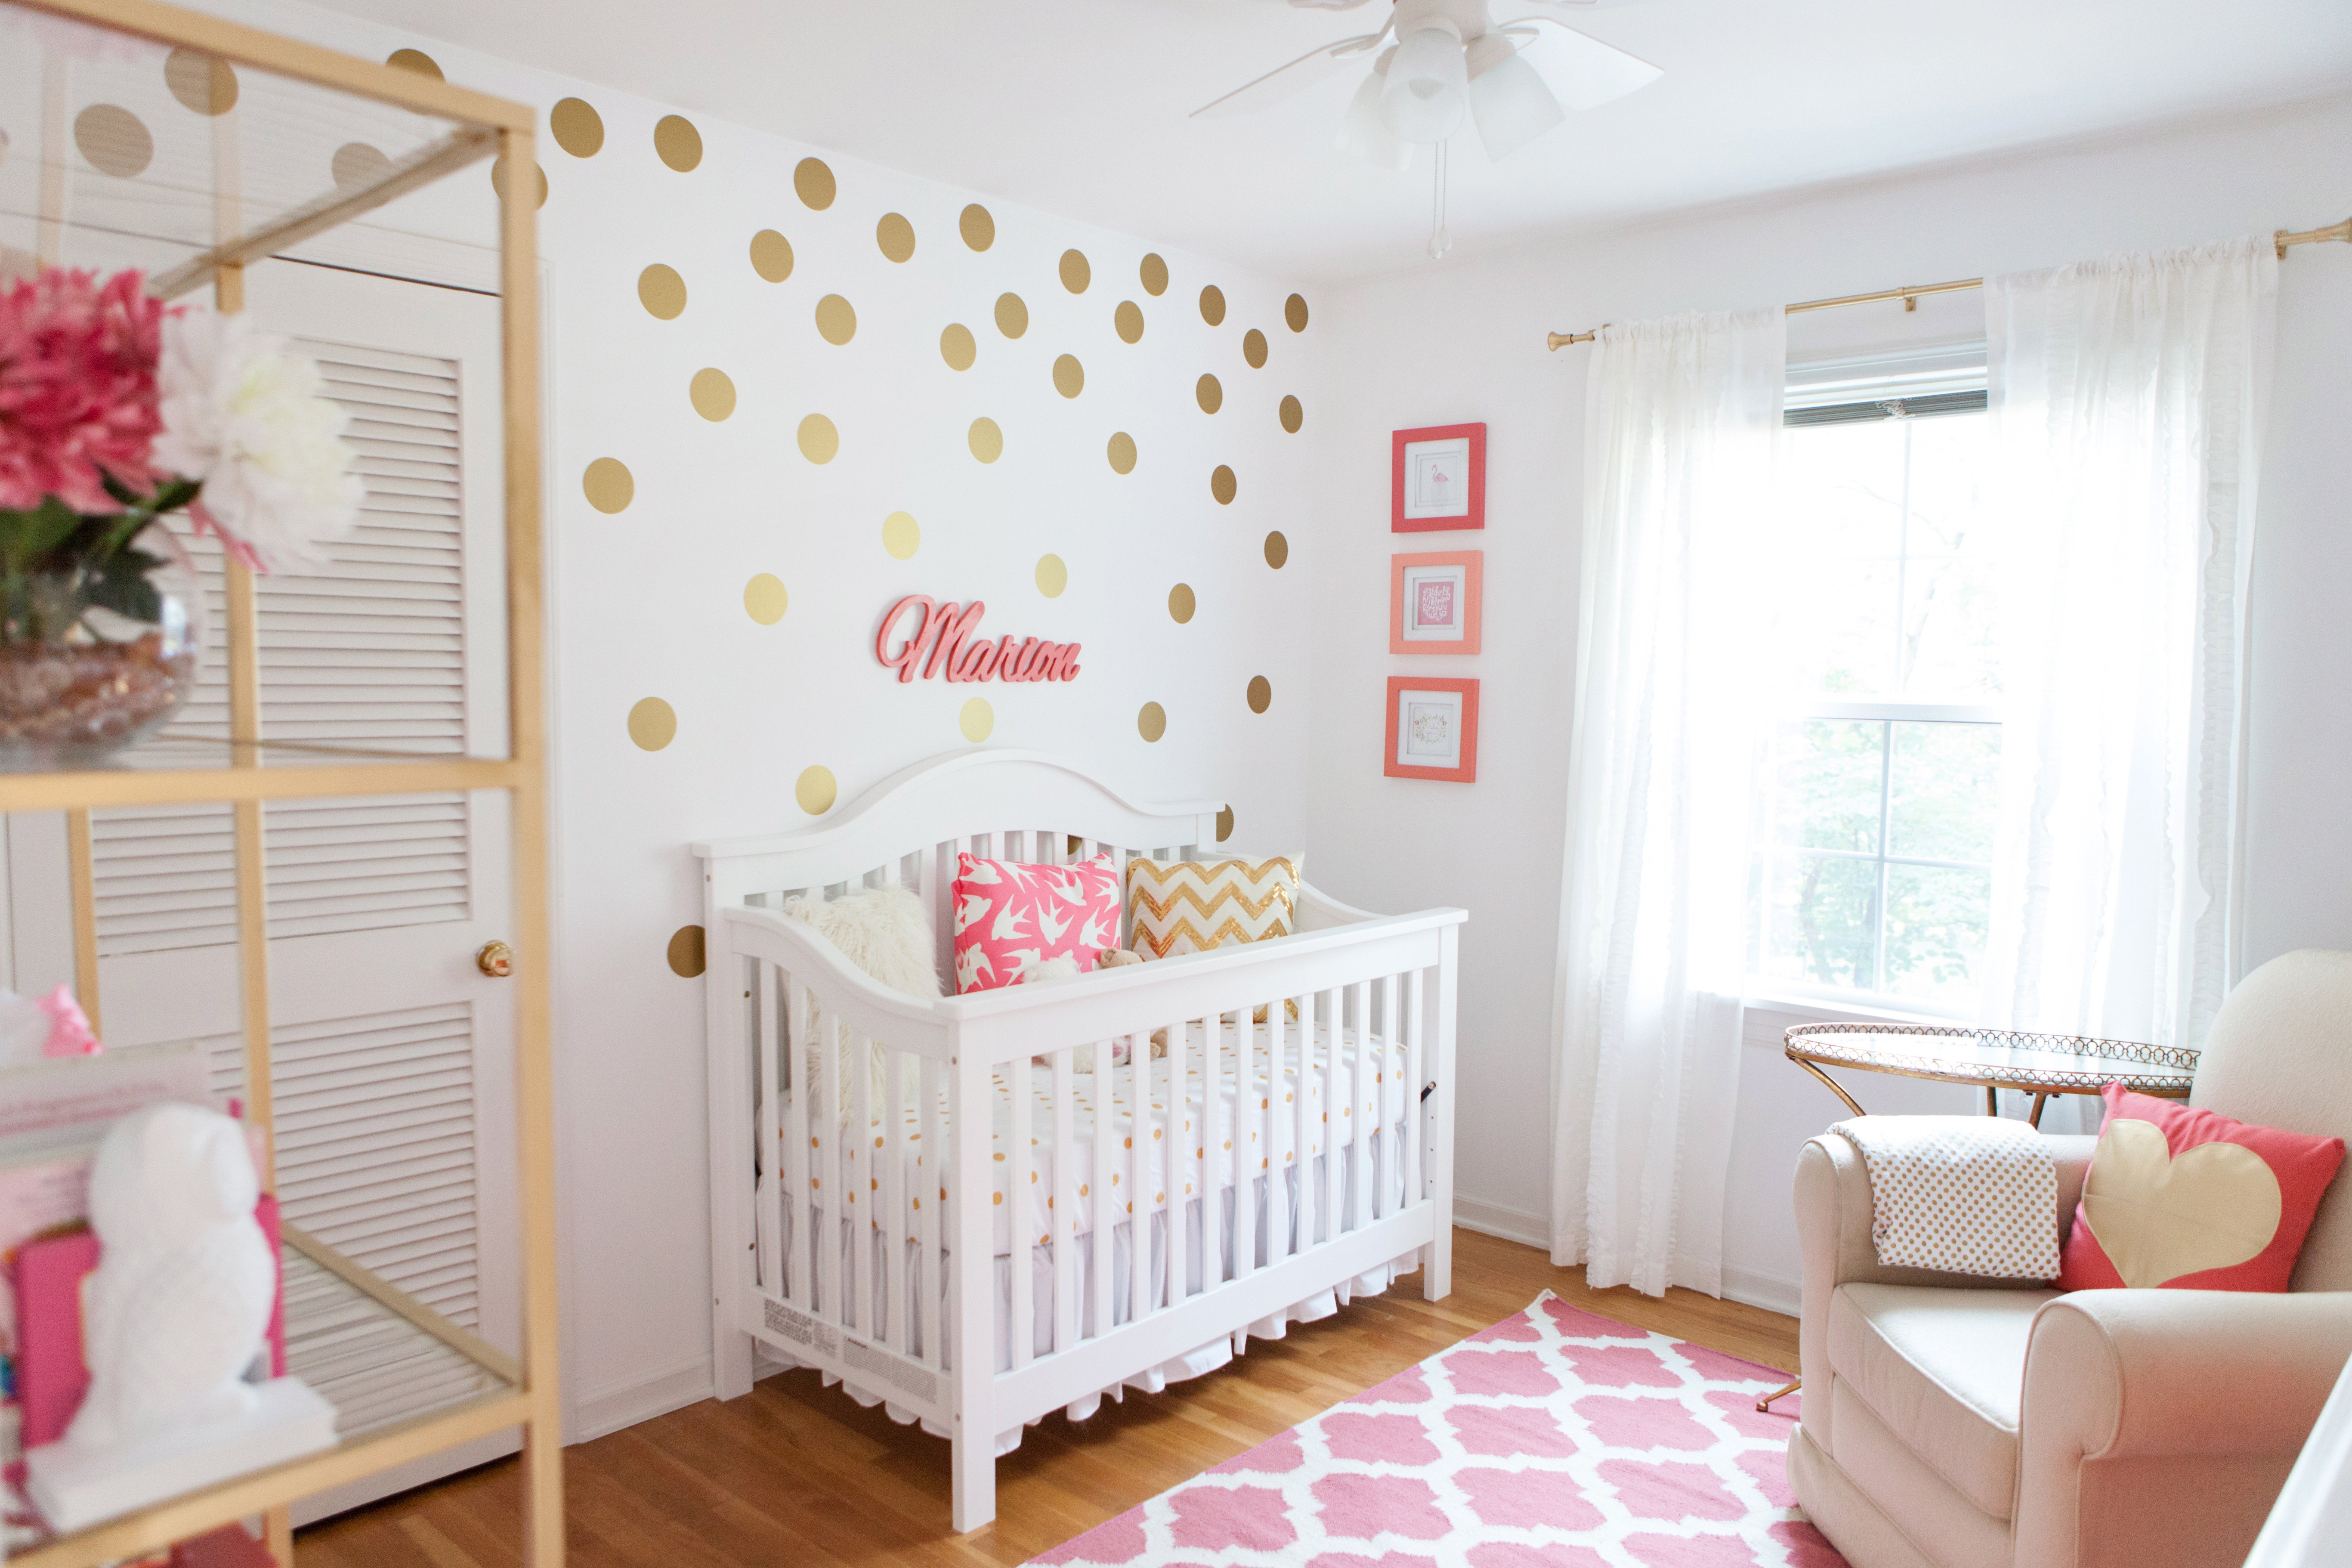 Baby Girl Nursery Decor Ideas Awesome Marion S Coral and Gold Polka Dot Nursery Project Nursery